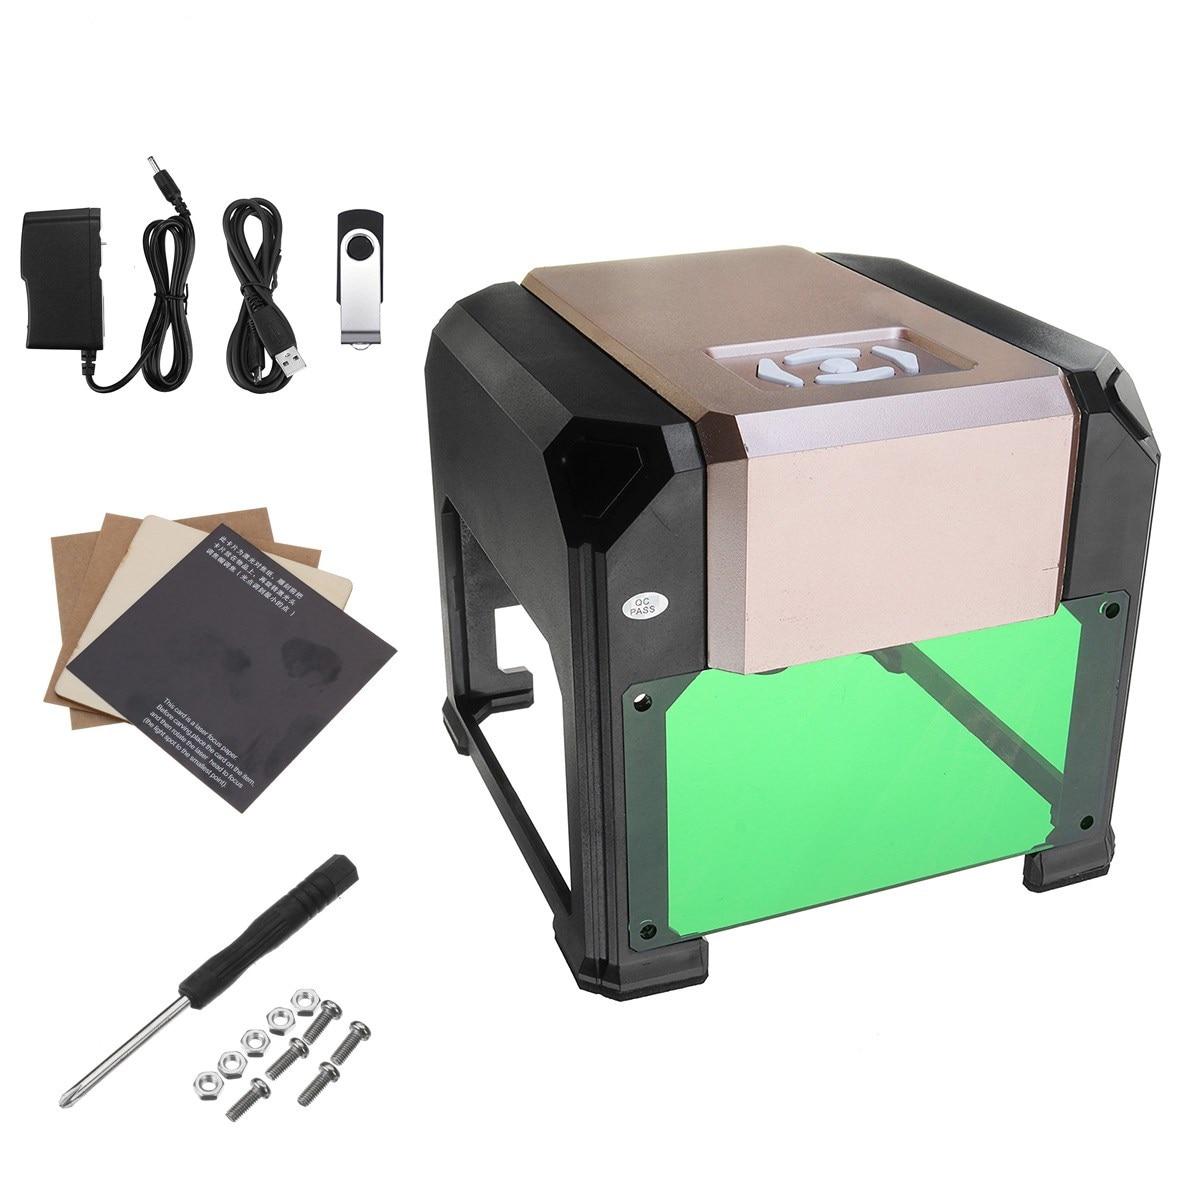 3000mw CNC K4 Laser Engraving Machine 8cm*8cm Home DIY Printer Cutter Woodworking Engraving Desktop Wood Router Laser Engraver